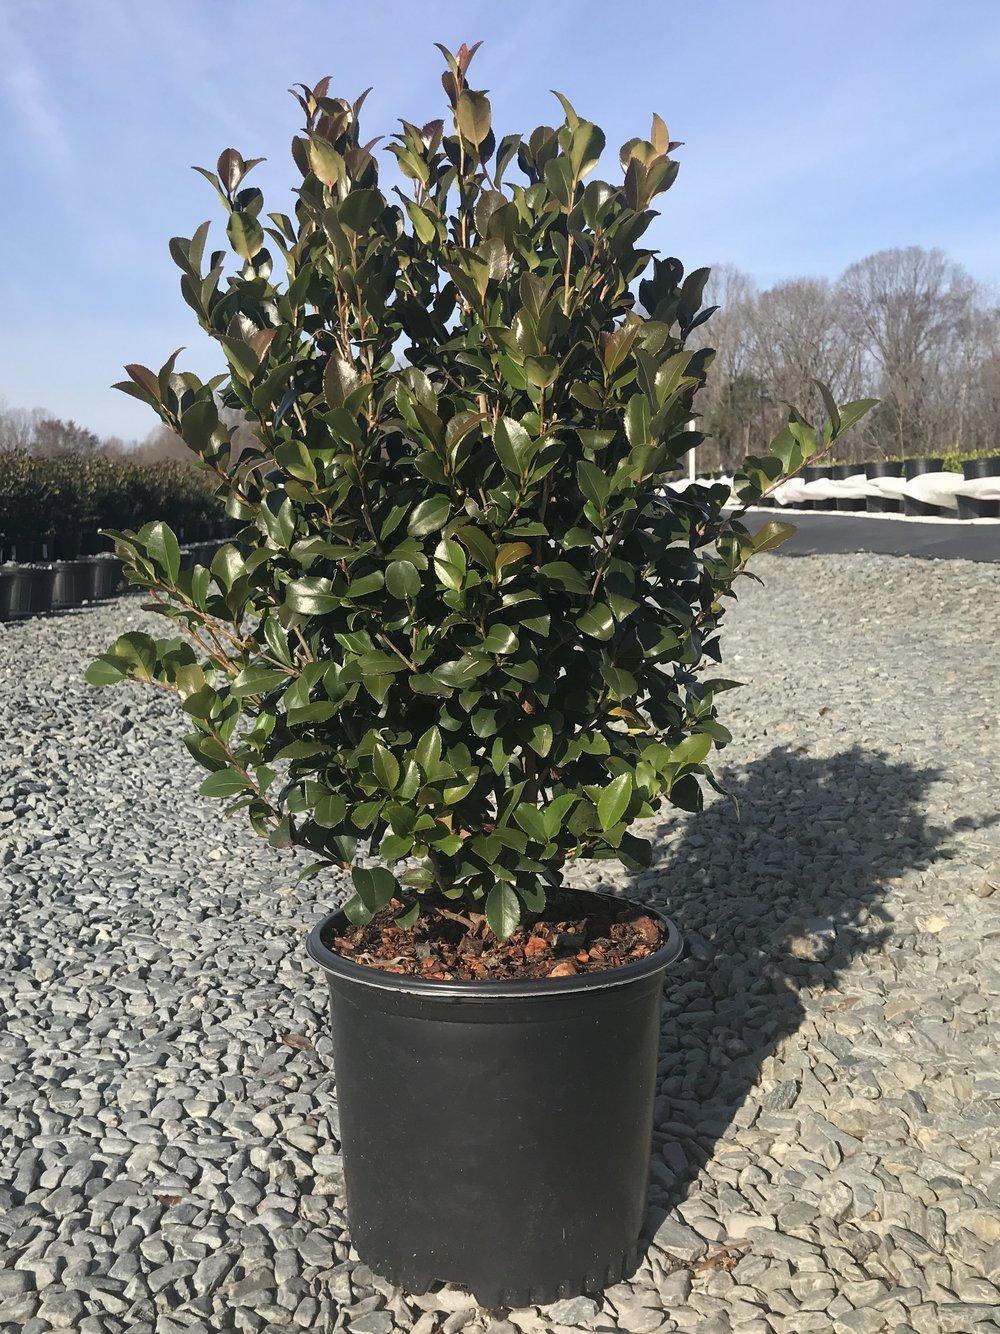 Camellia sasanqua 'Cleopatra' 3 gallon